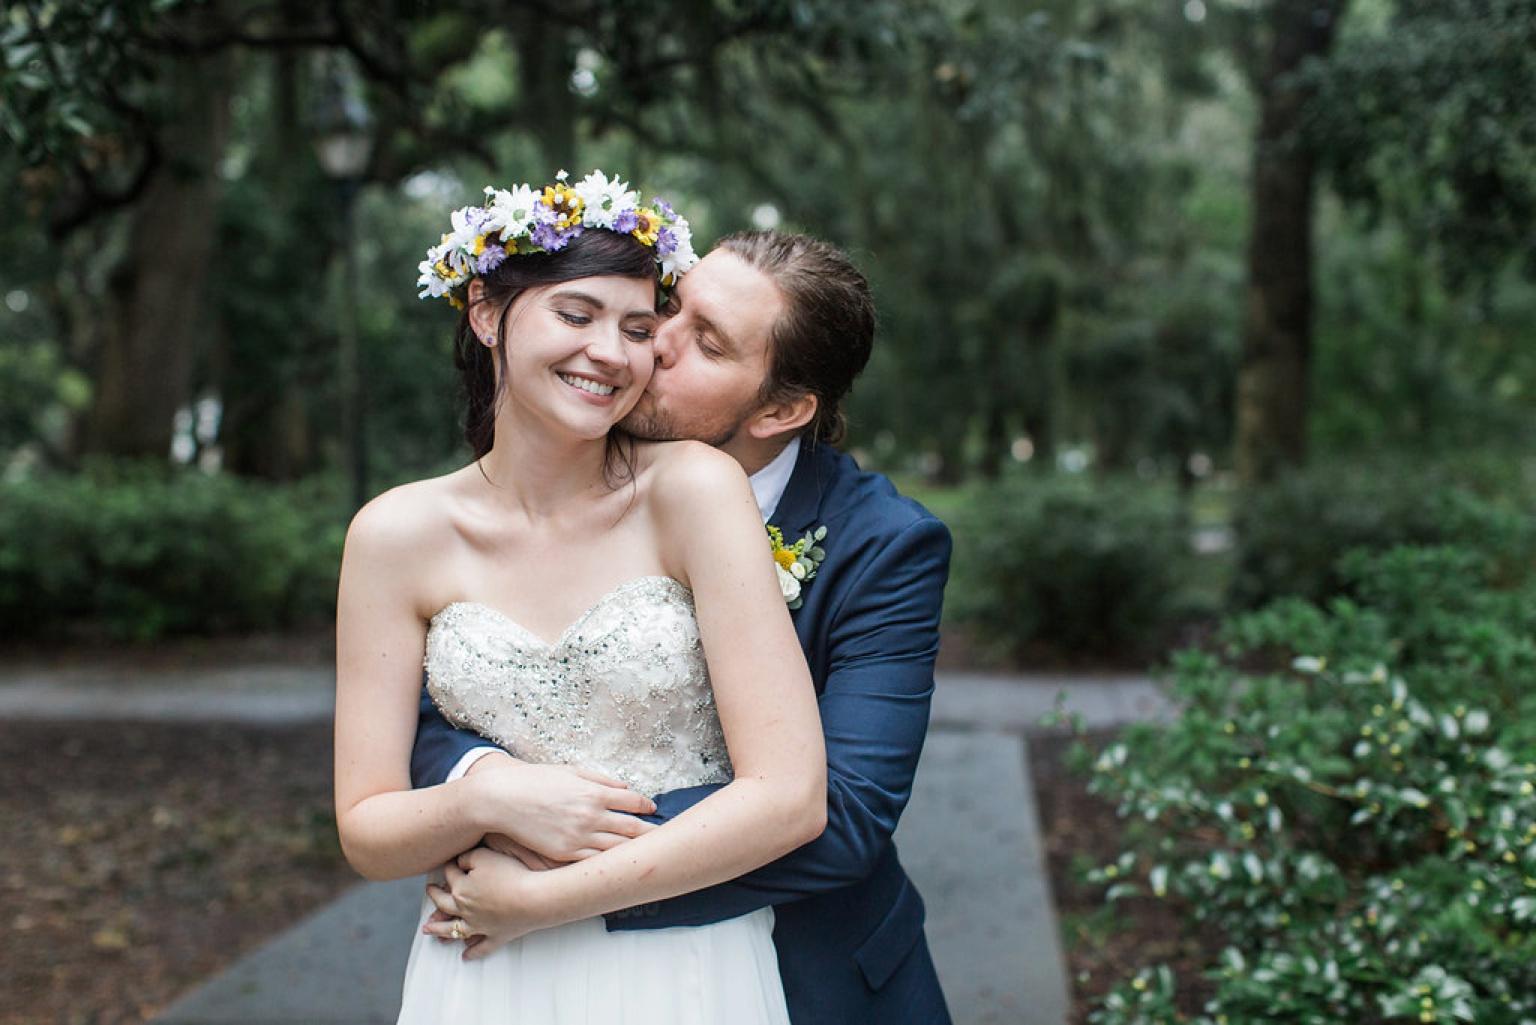 Apt_B_Photo_Savannah_Wedding_Photographer_Flower_Crown051.JPG